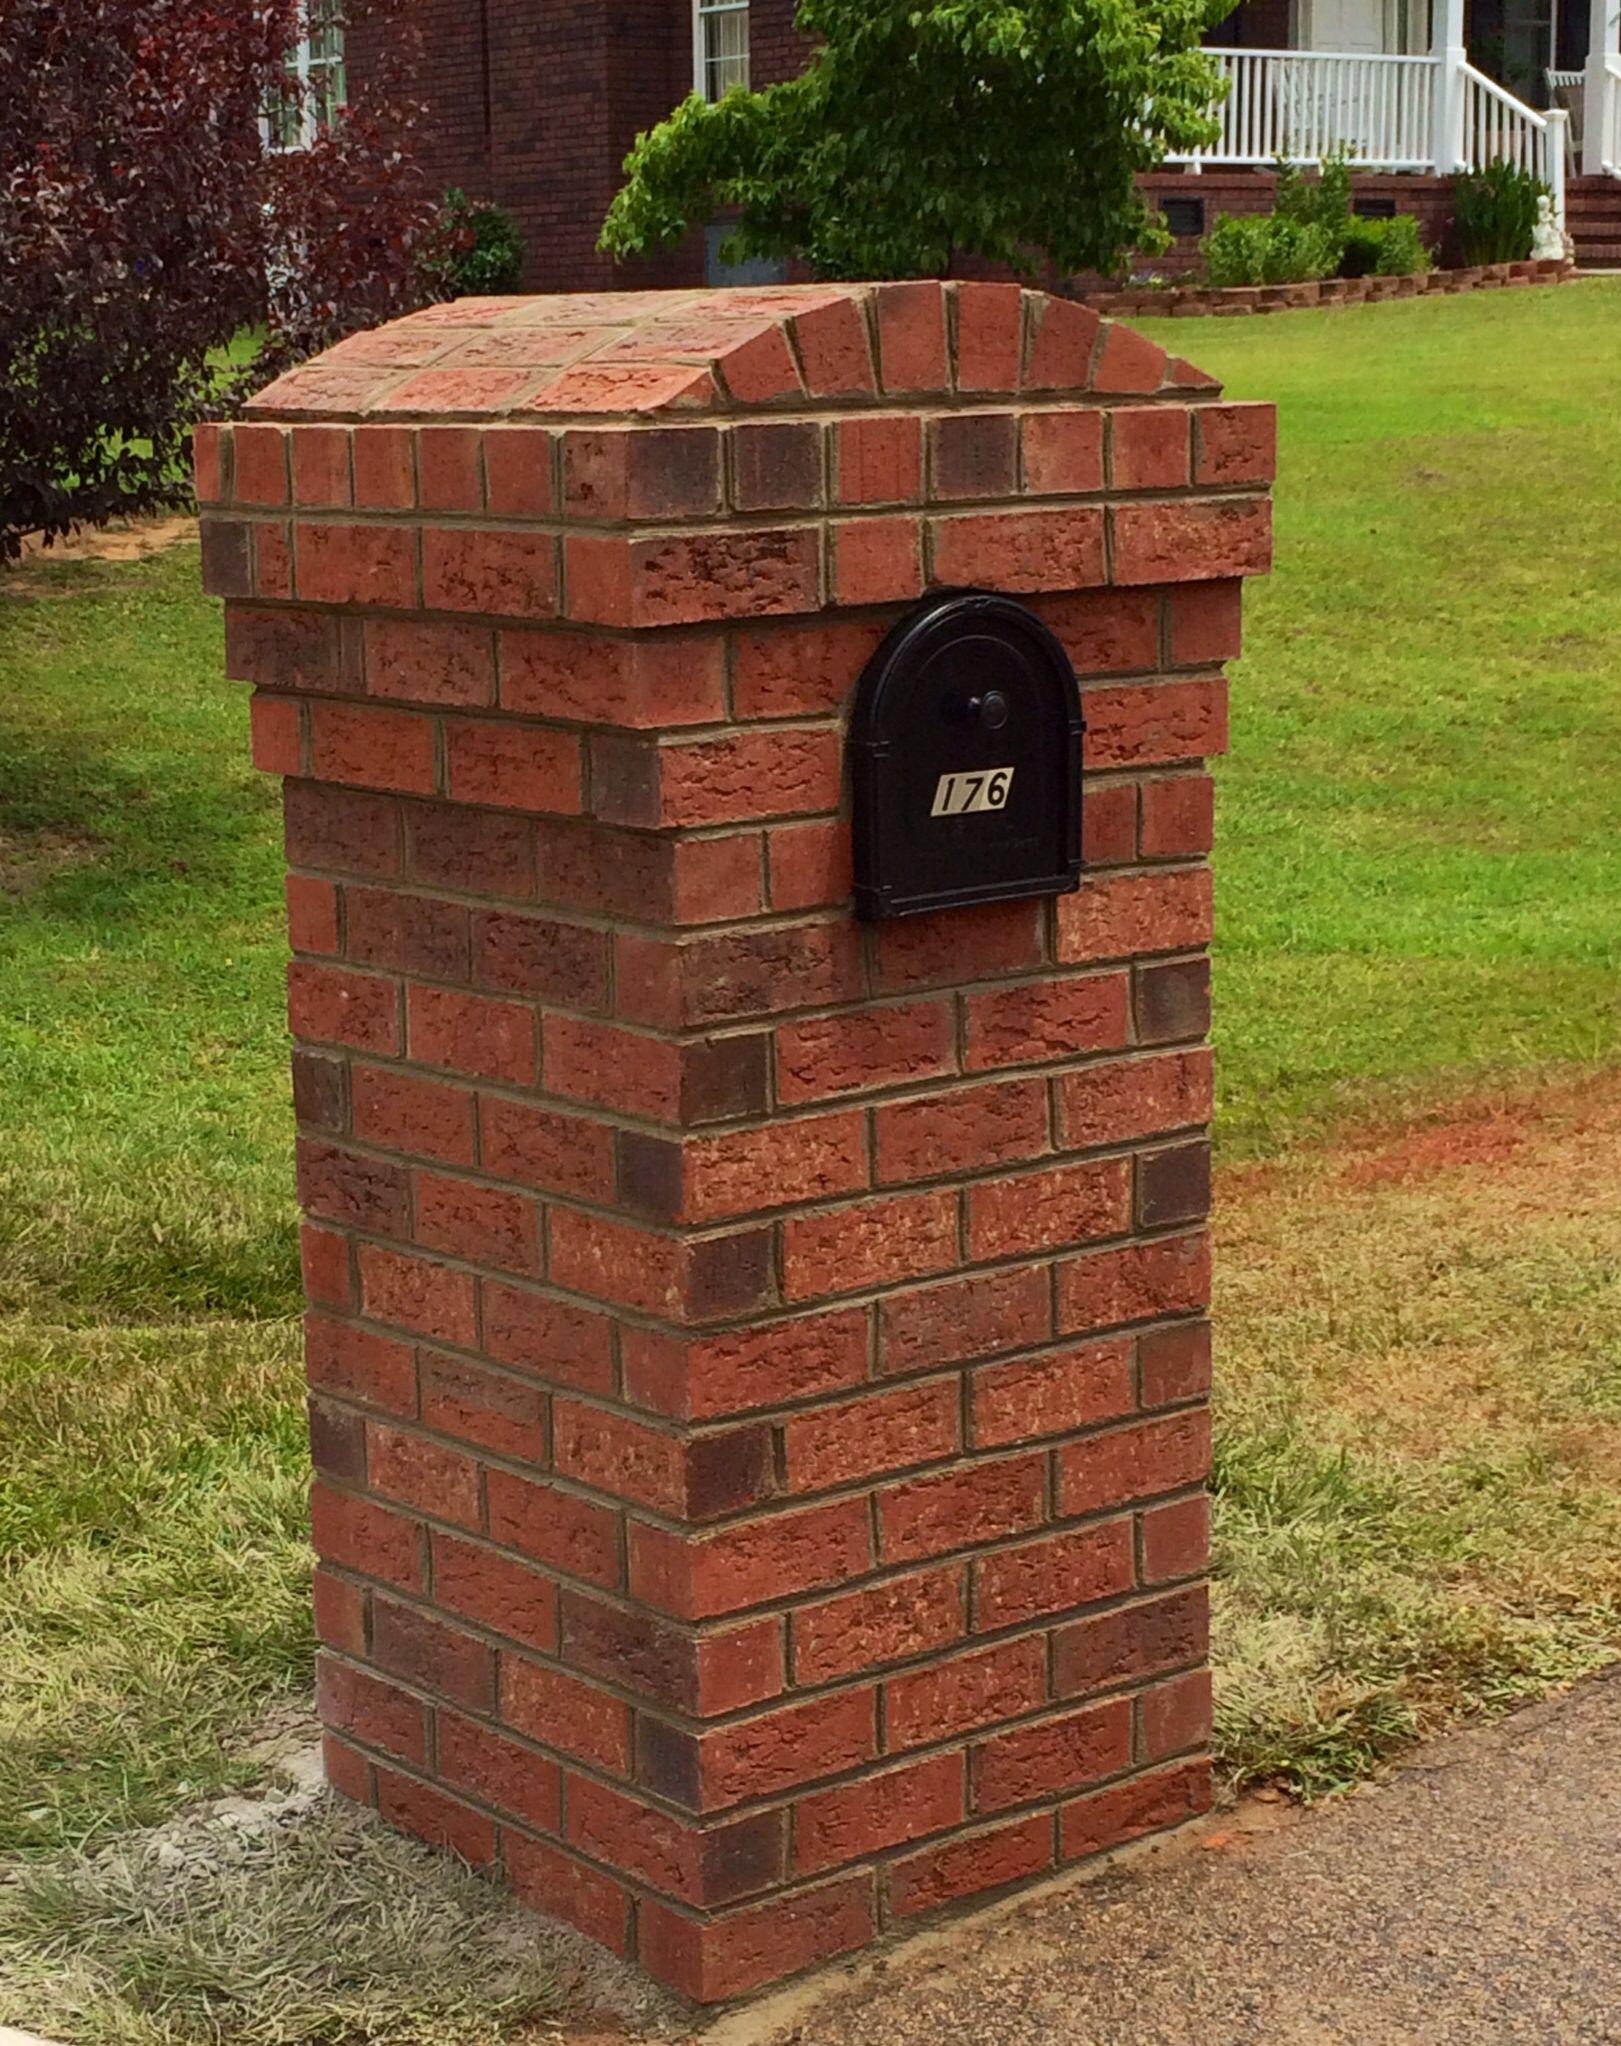 Brick Mailbox Brick Mailbox Mailbox Landscaping 400 x 300